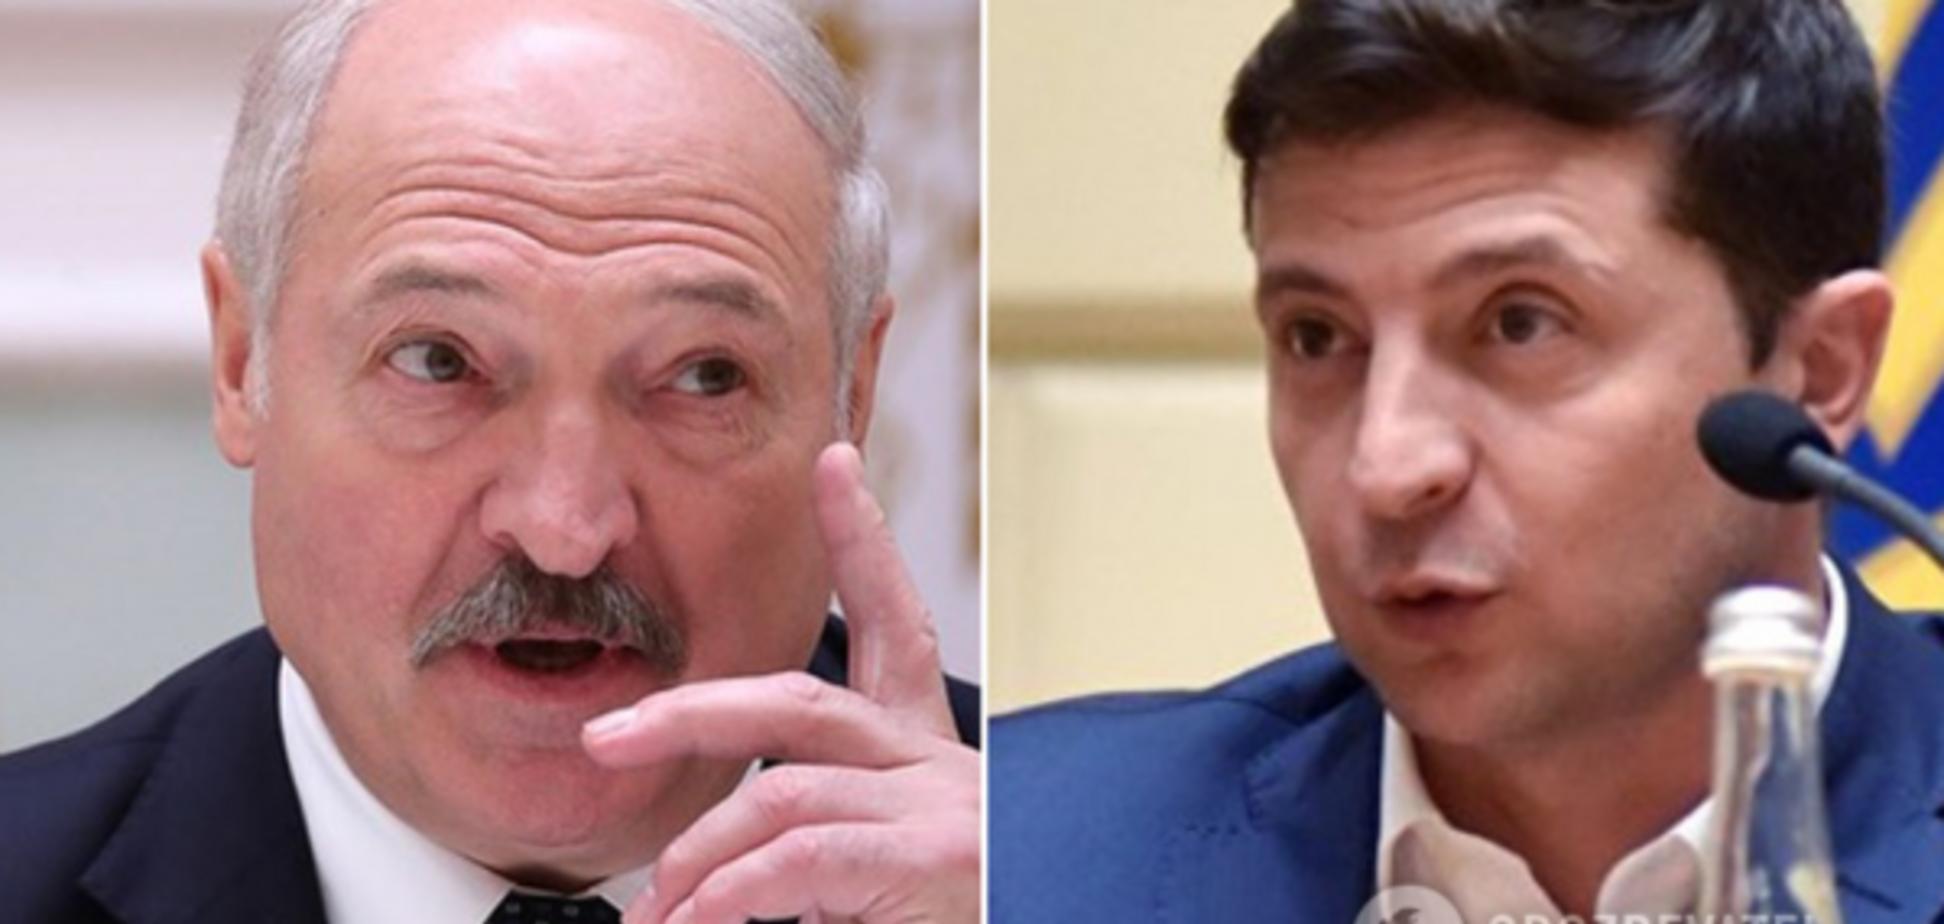 Лукашенко отправил подарок Зеленскому. Фото